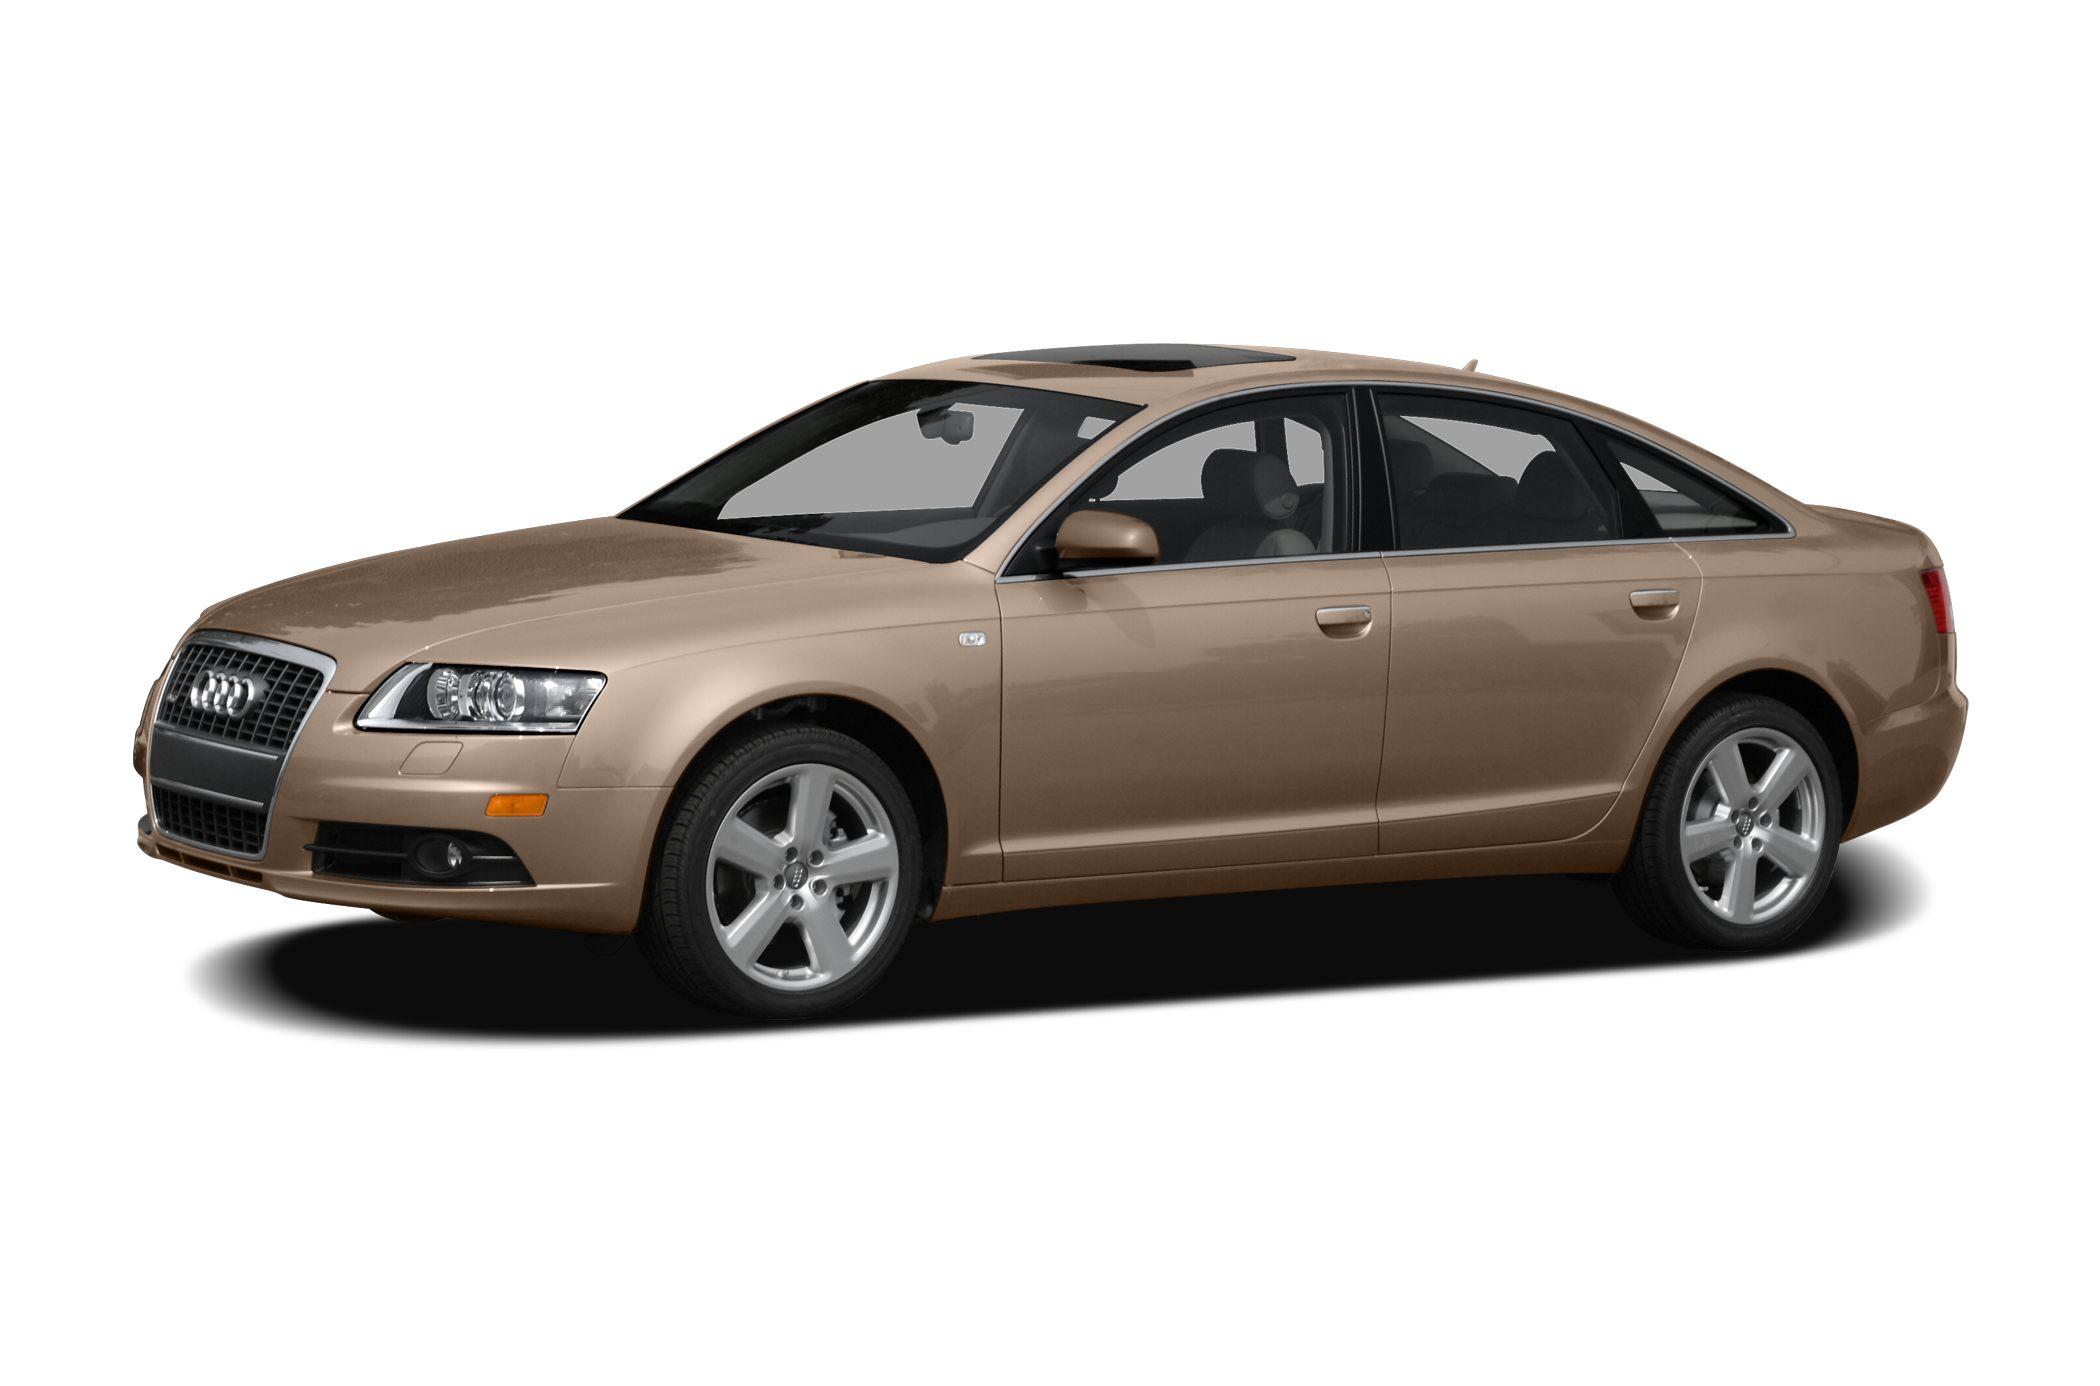 2008 Audi A6 4 2 4dr All Wheel Drive Quattro Sedan Specs And Prices